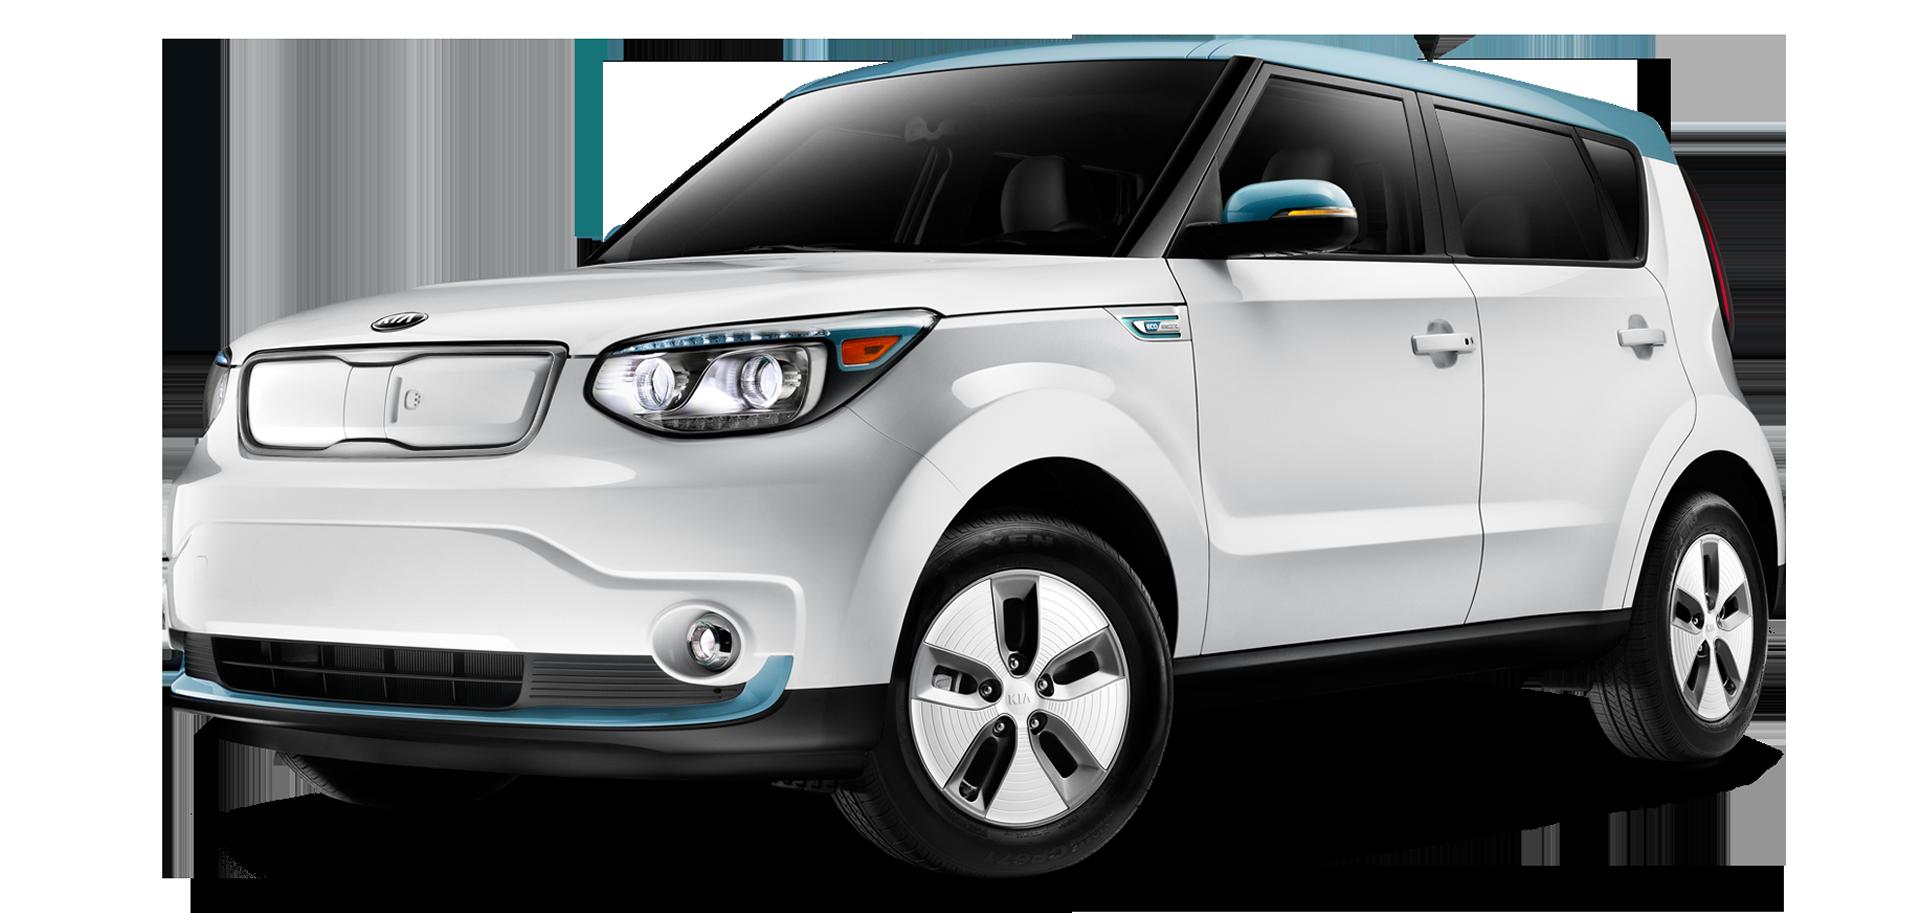 2015 Kia Soul Ev Electric Cars Zero Emission Cars Experience Kia Soul Kia Mini Van